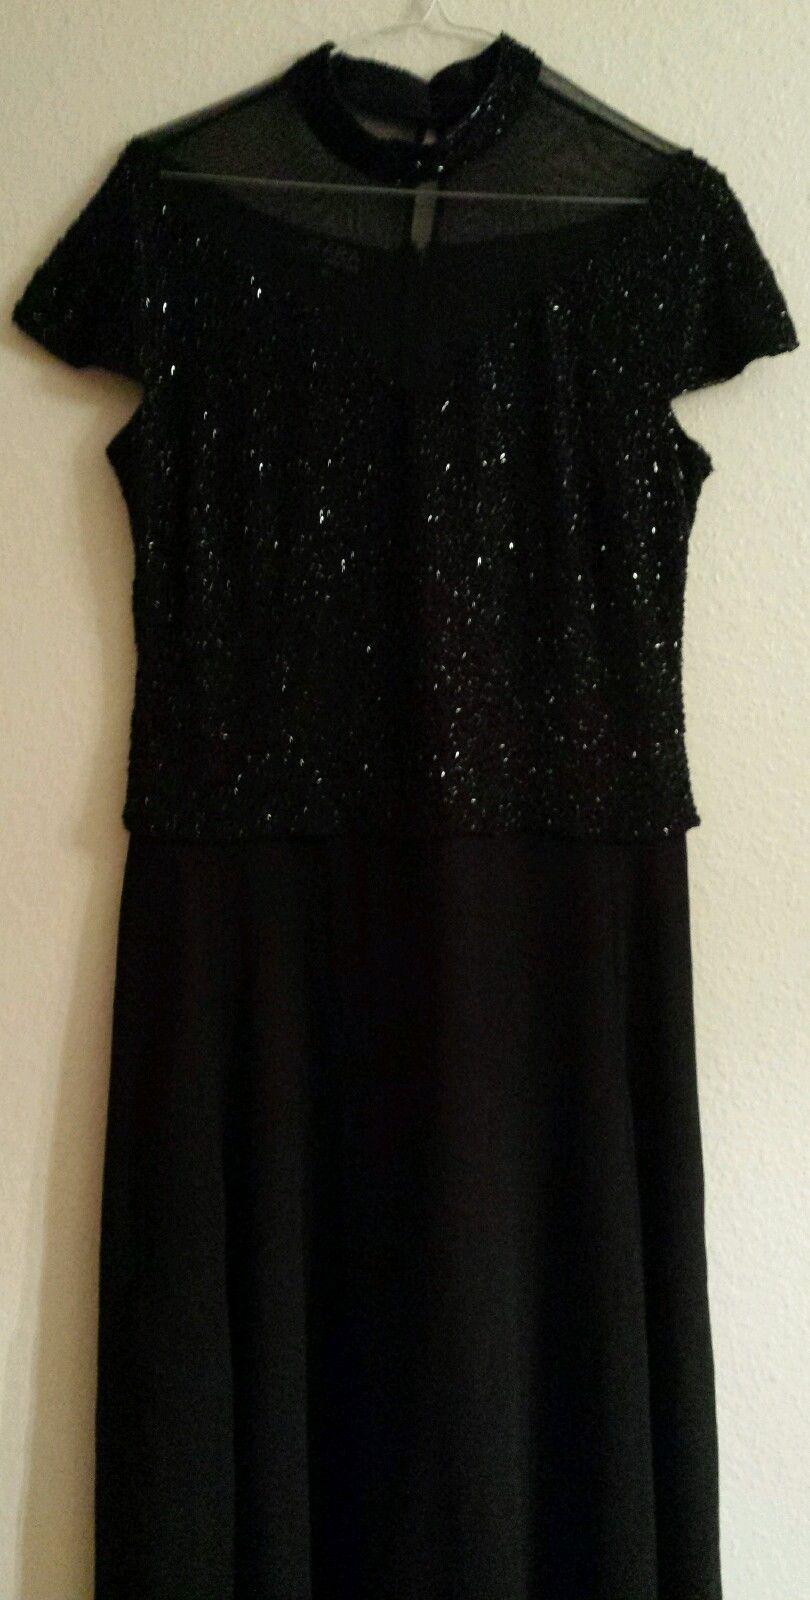 Awesome amazing jkara new york long formal black dress beaded top